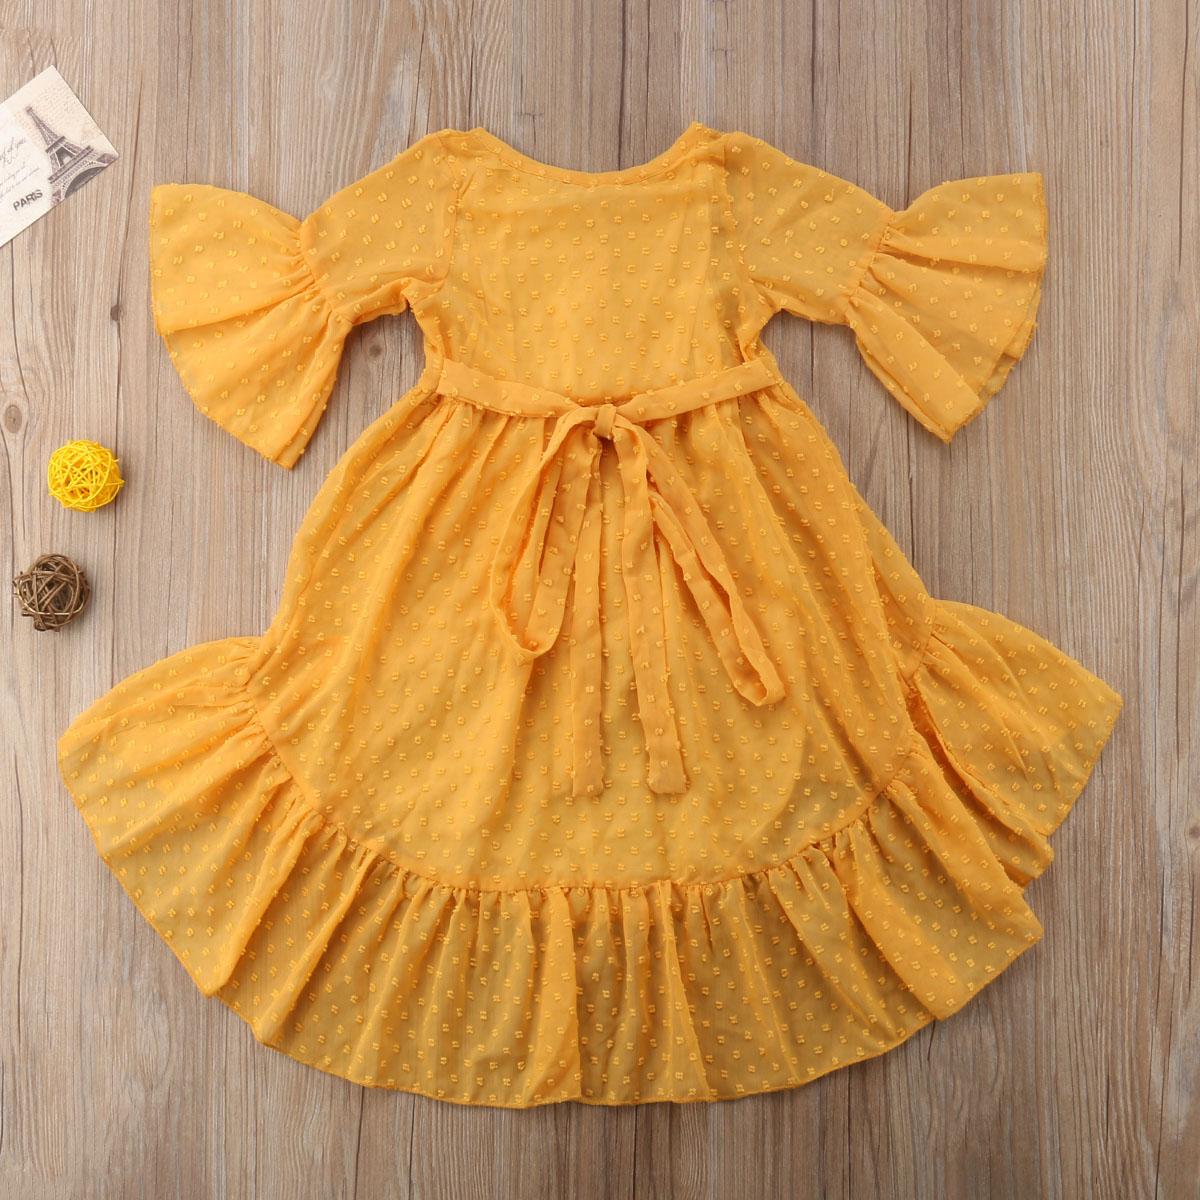 2018 Brand New Princess Fashion Toddler Baby Girls Boho Party Dress